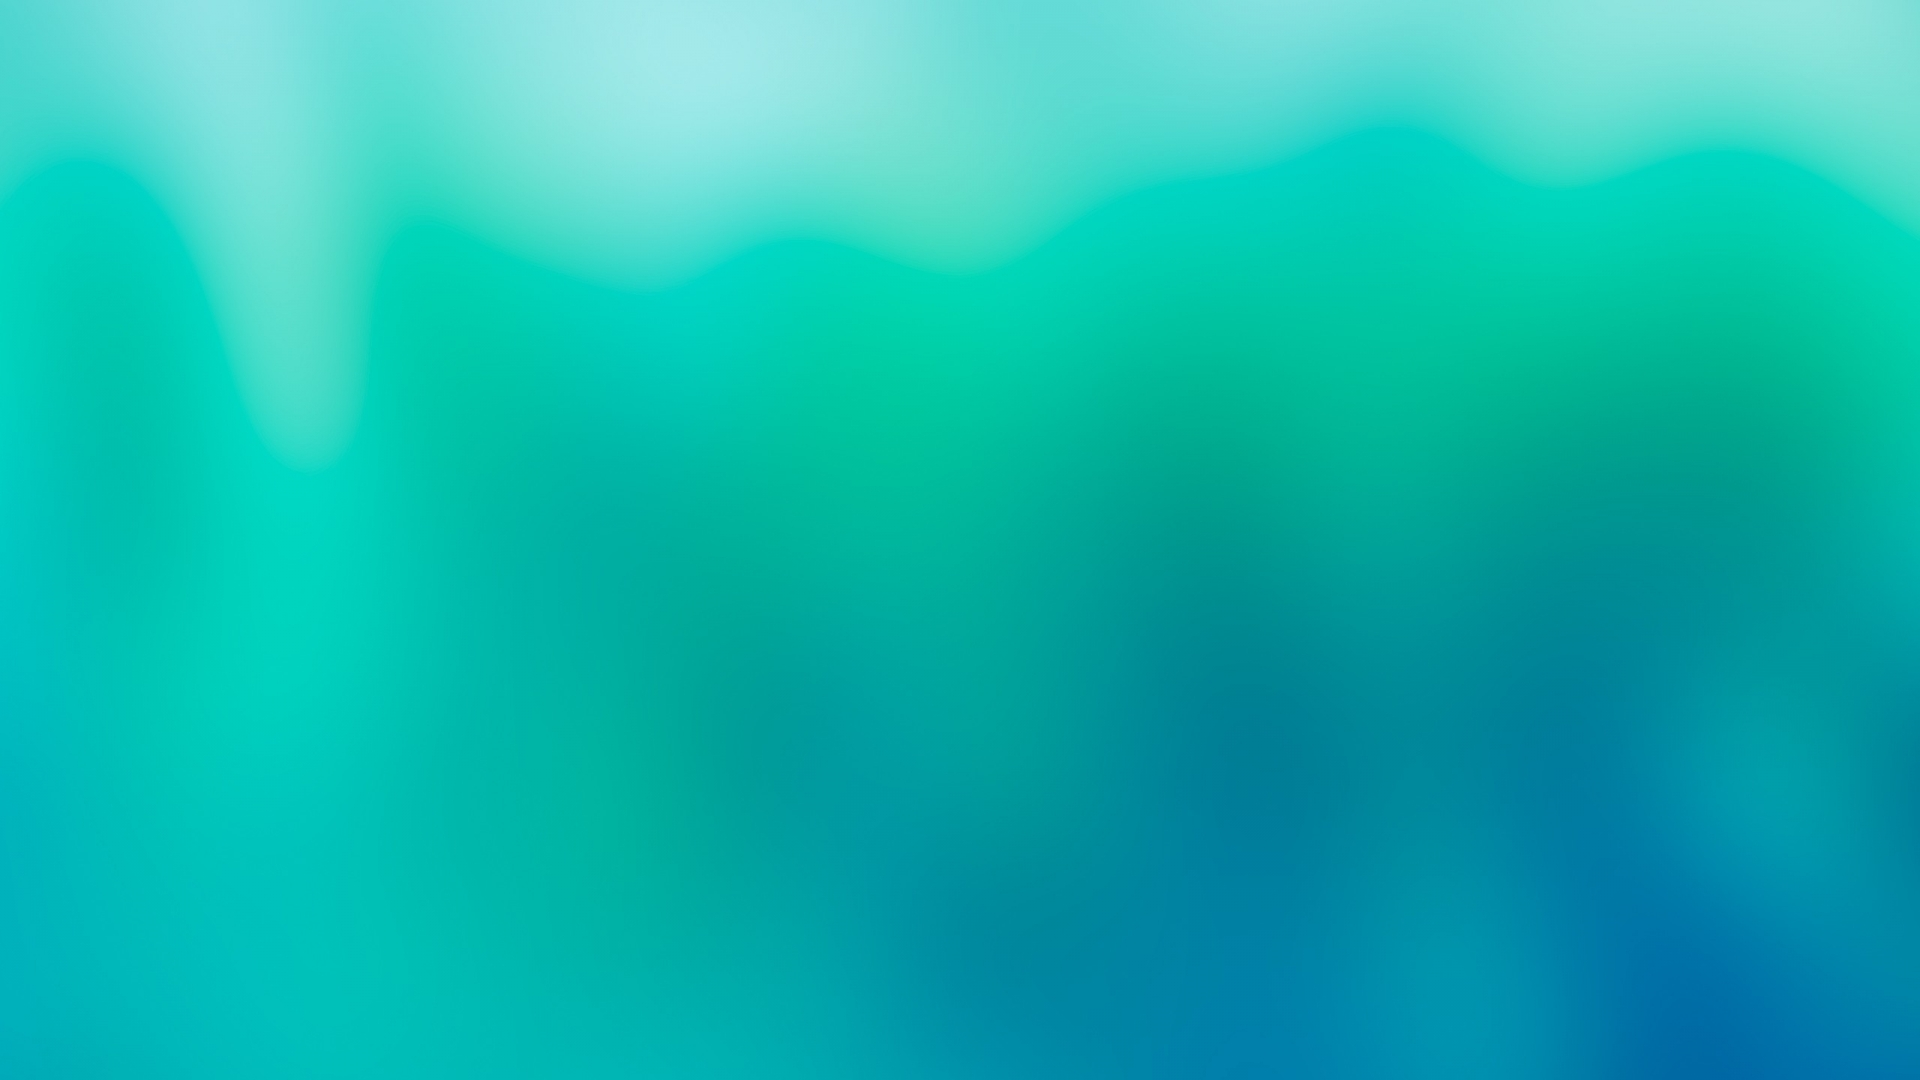 wallpapers azul turquesa imagui - photo #5